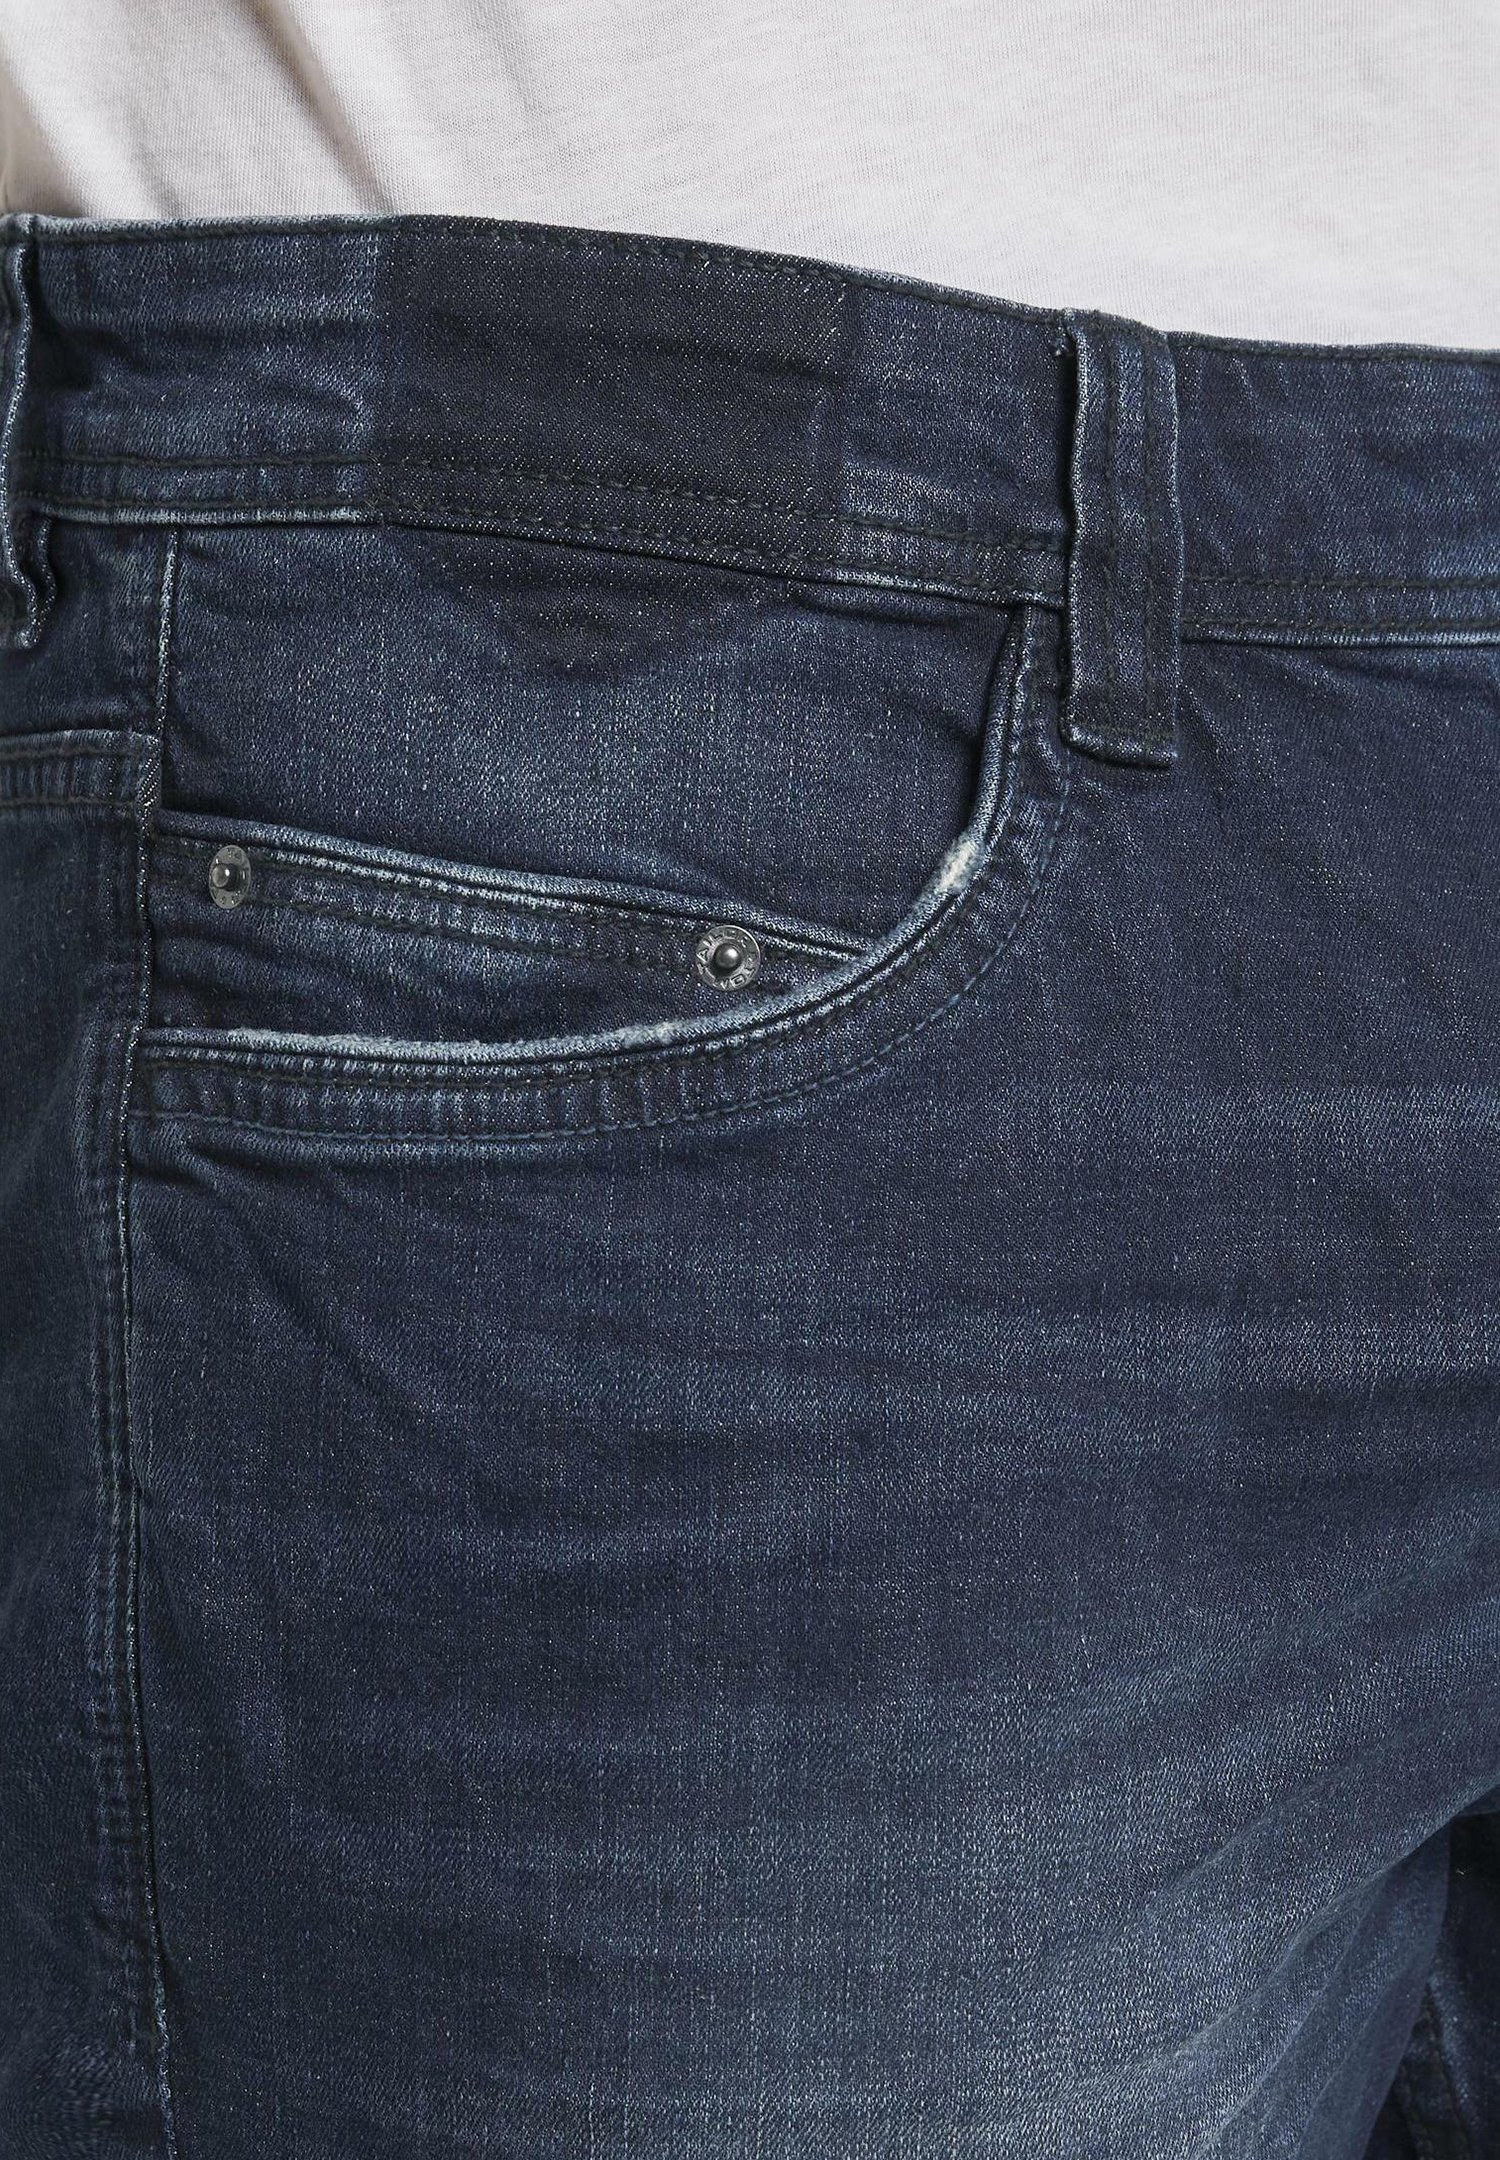 Tom Tailor Shosen Josh - Jeans Shorts Light Stone Wash Denim